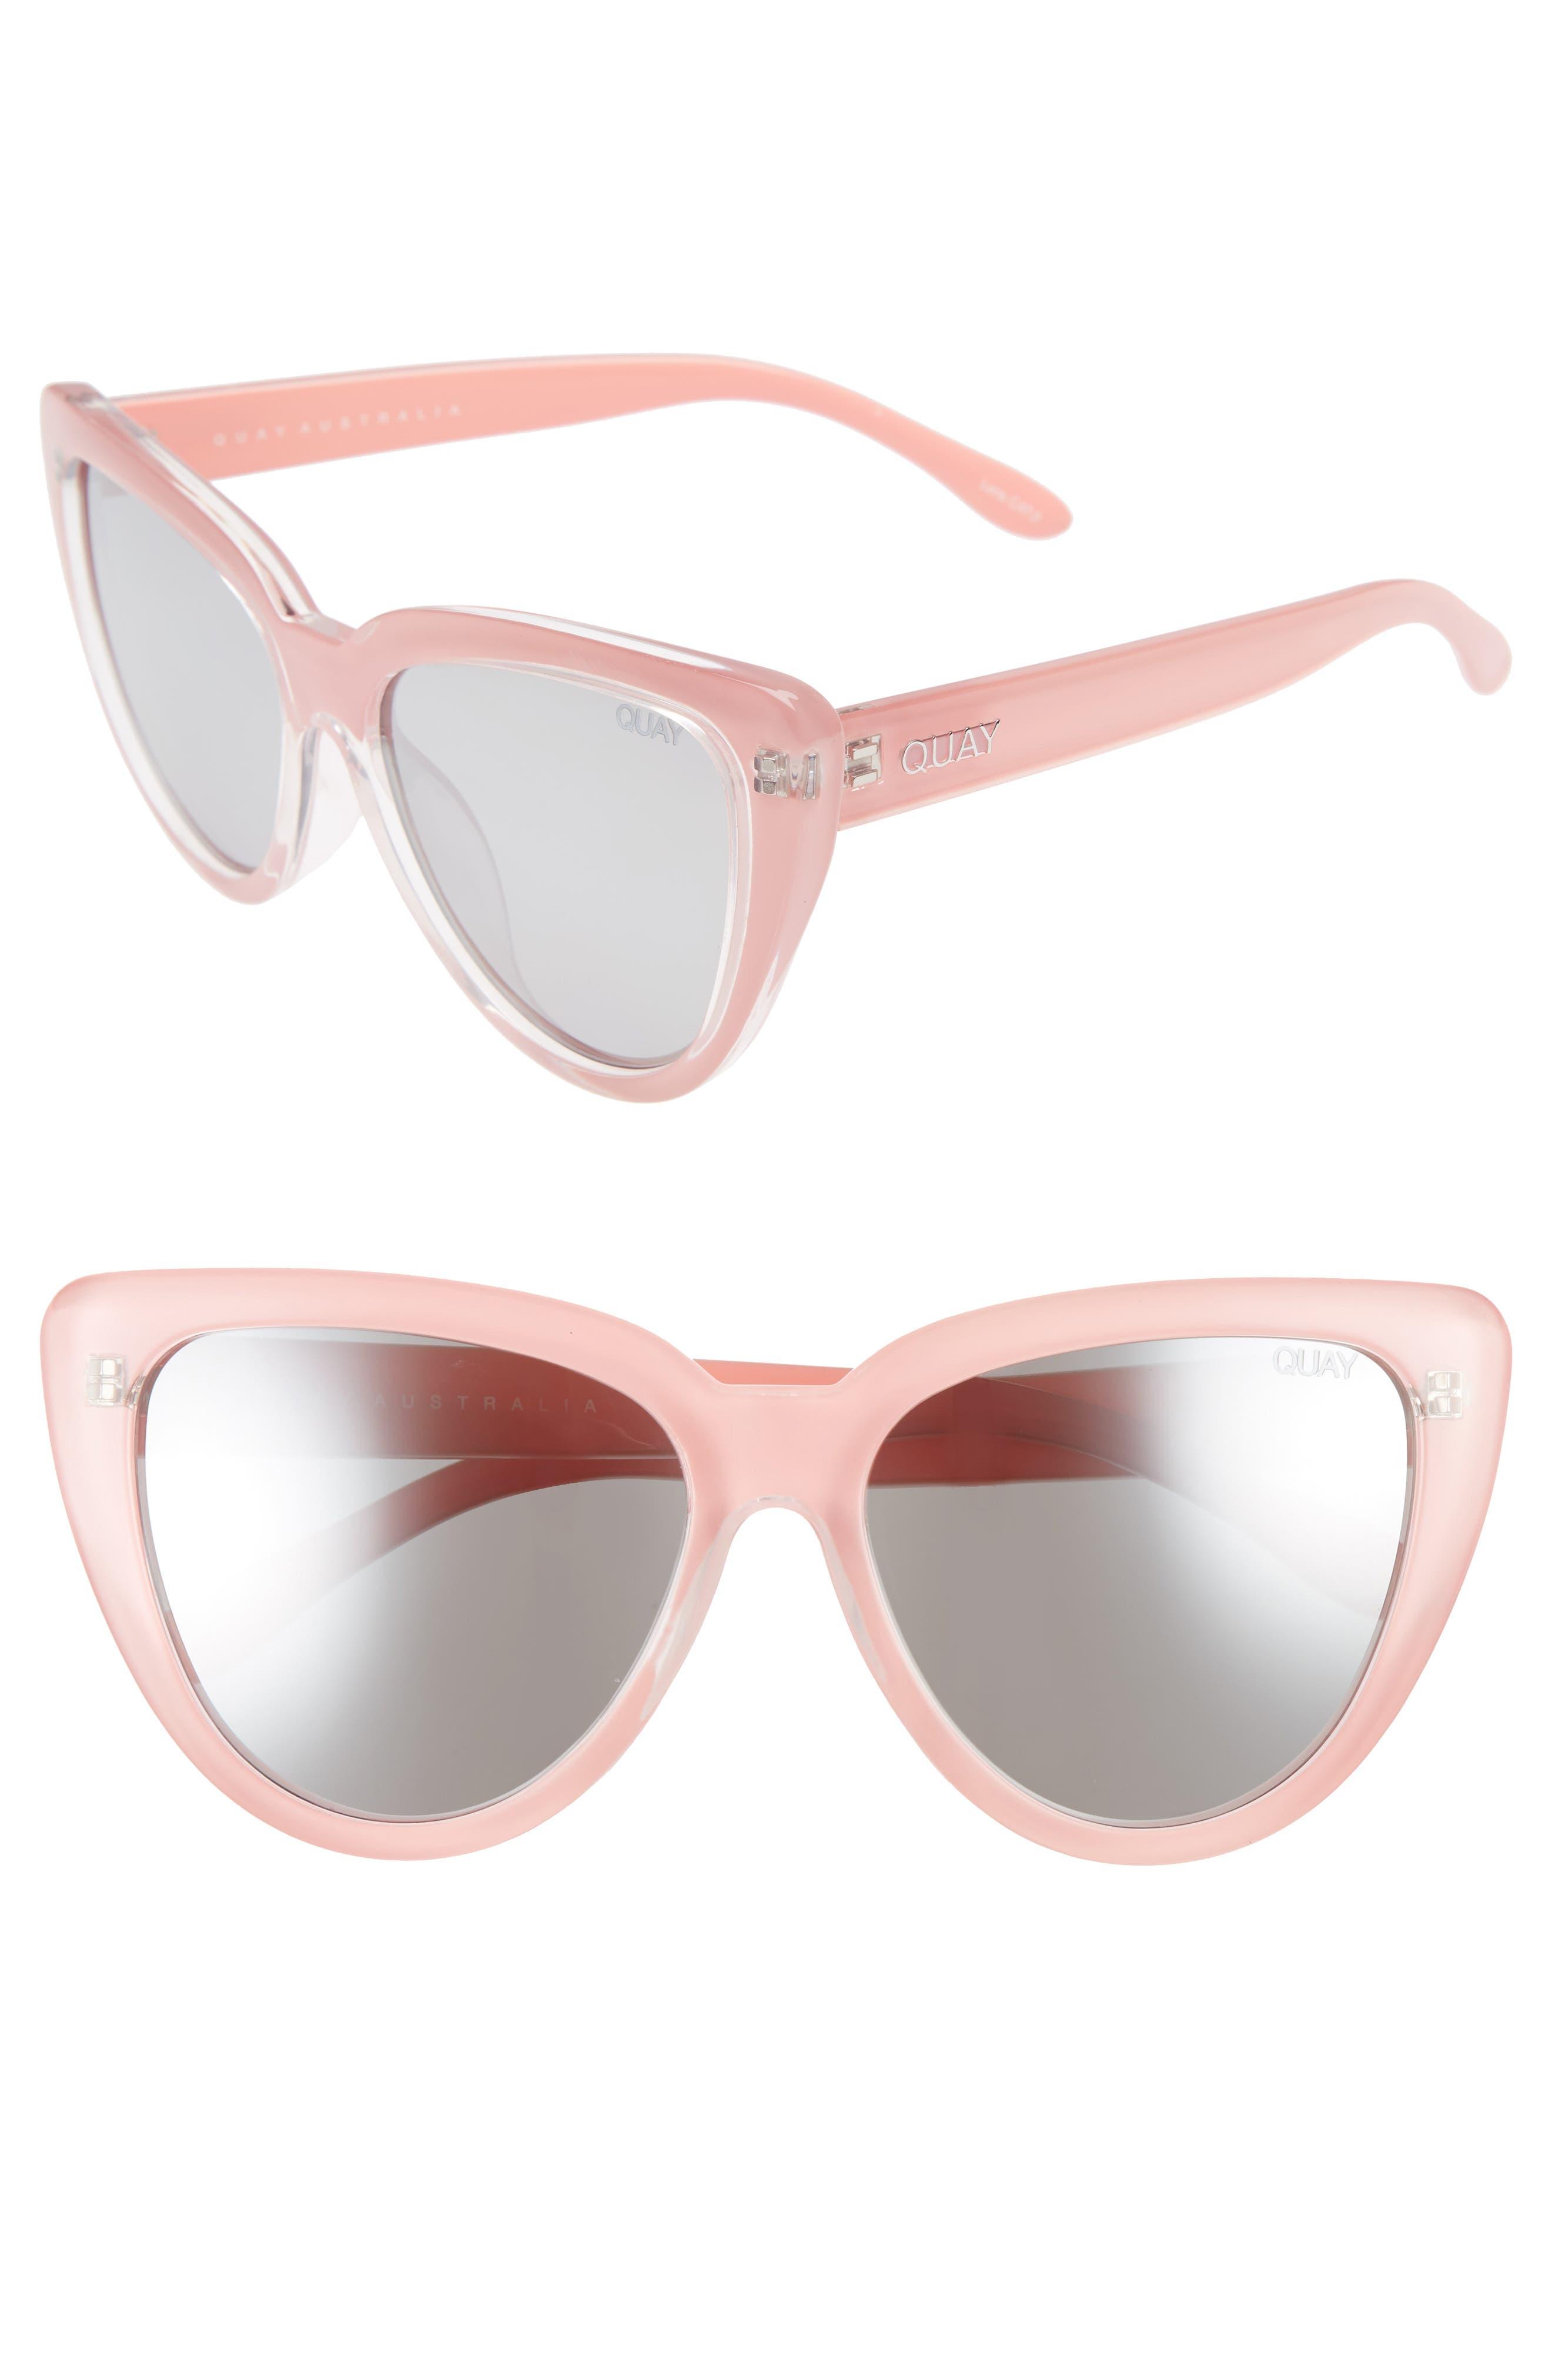 Stray Cat 58mm Mirrored Cat Eye Sunglasses by Quay Australia